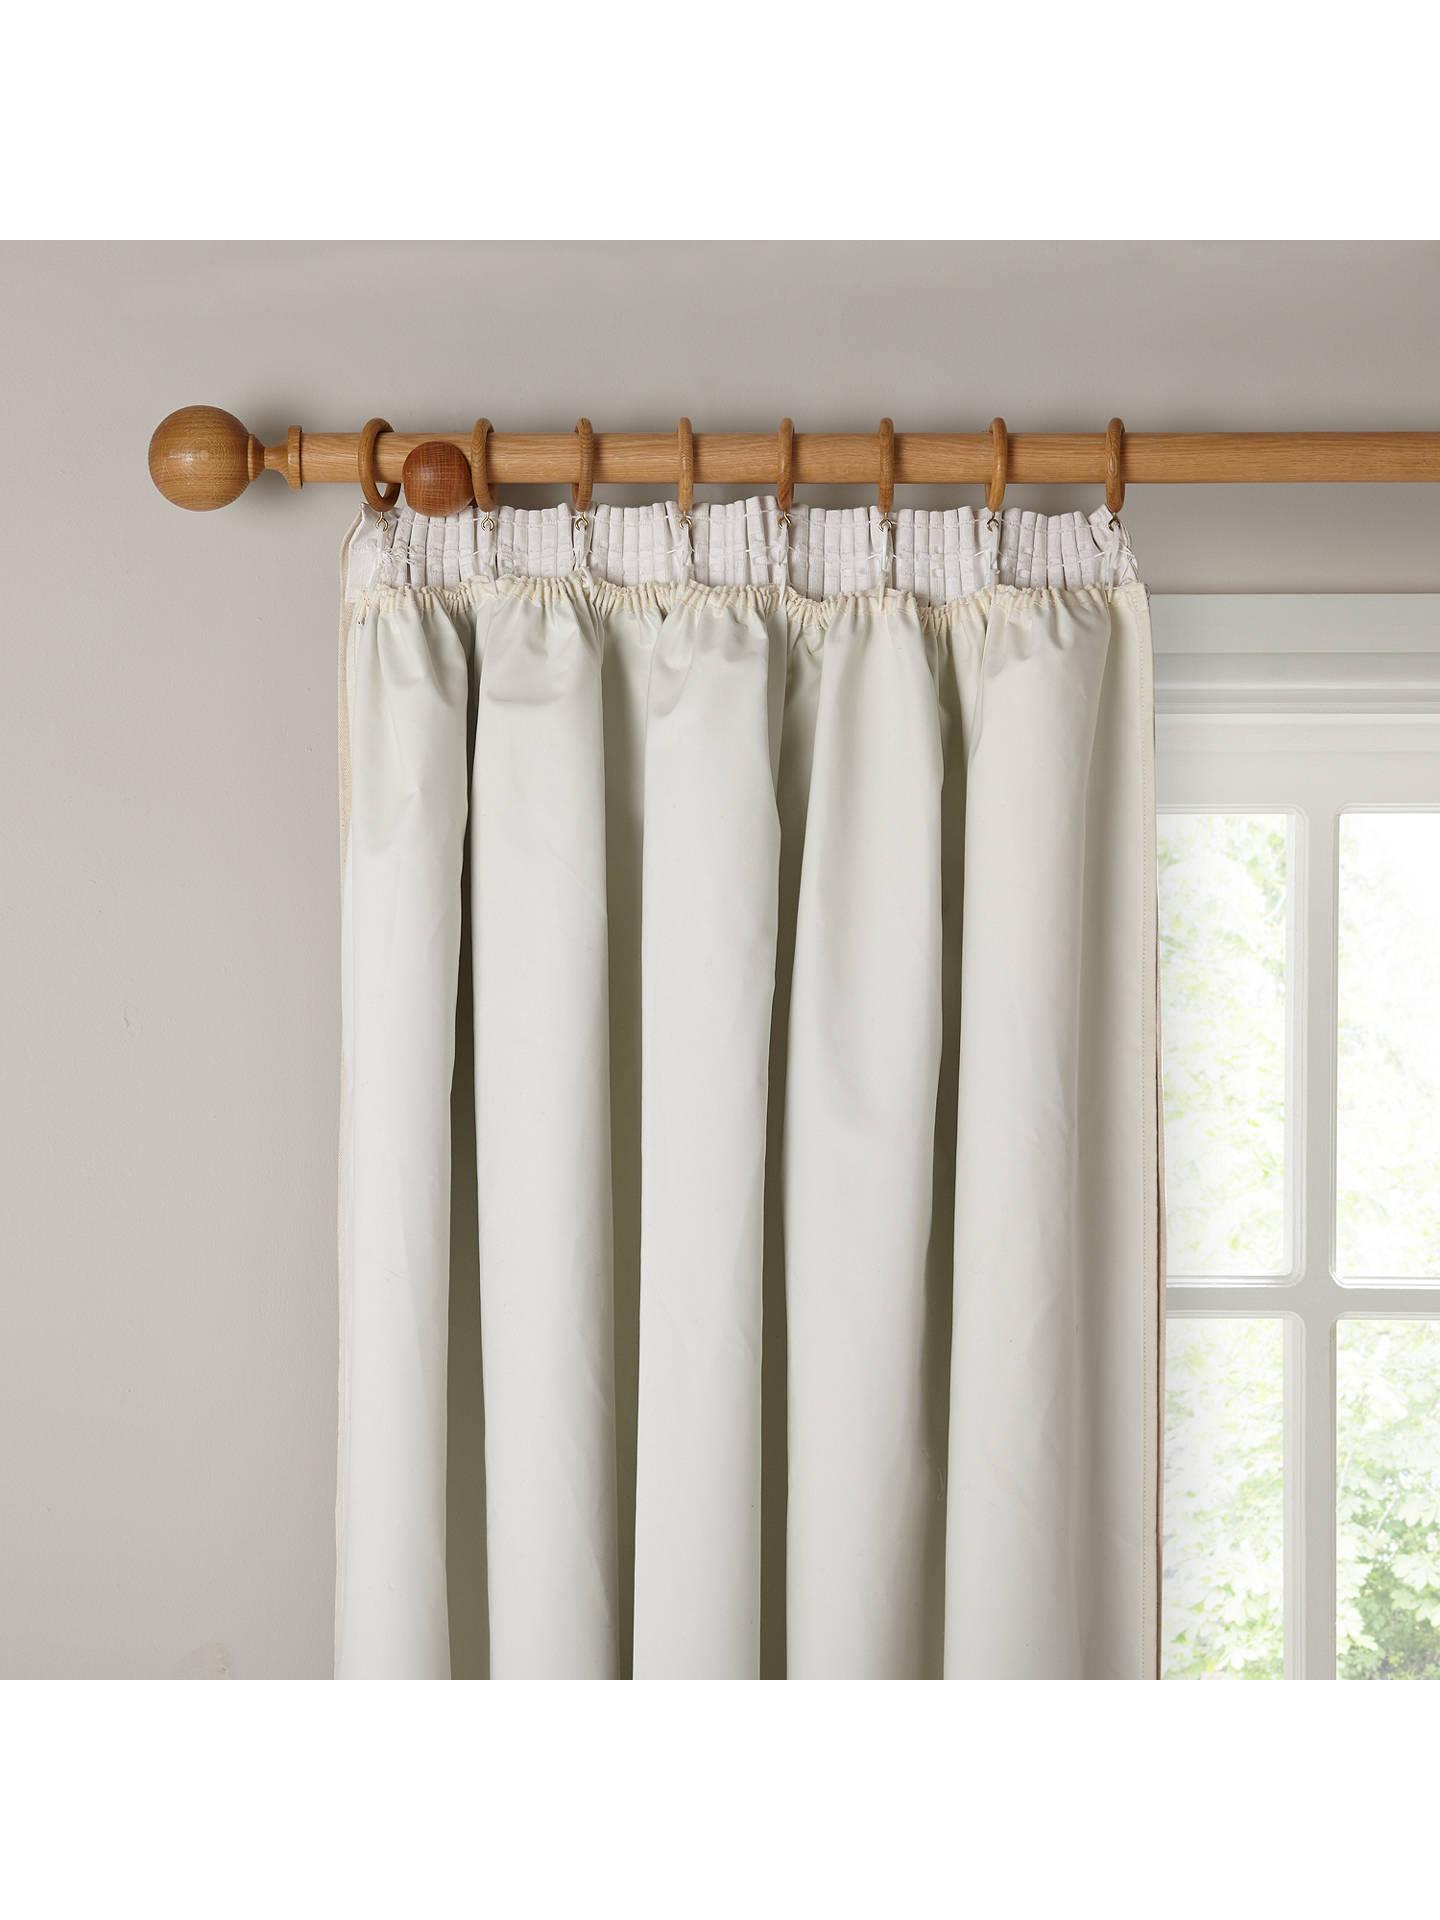 John Lewis Partners Pencil Pleat Pair Blackout Curtain Linings